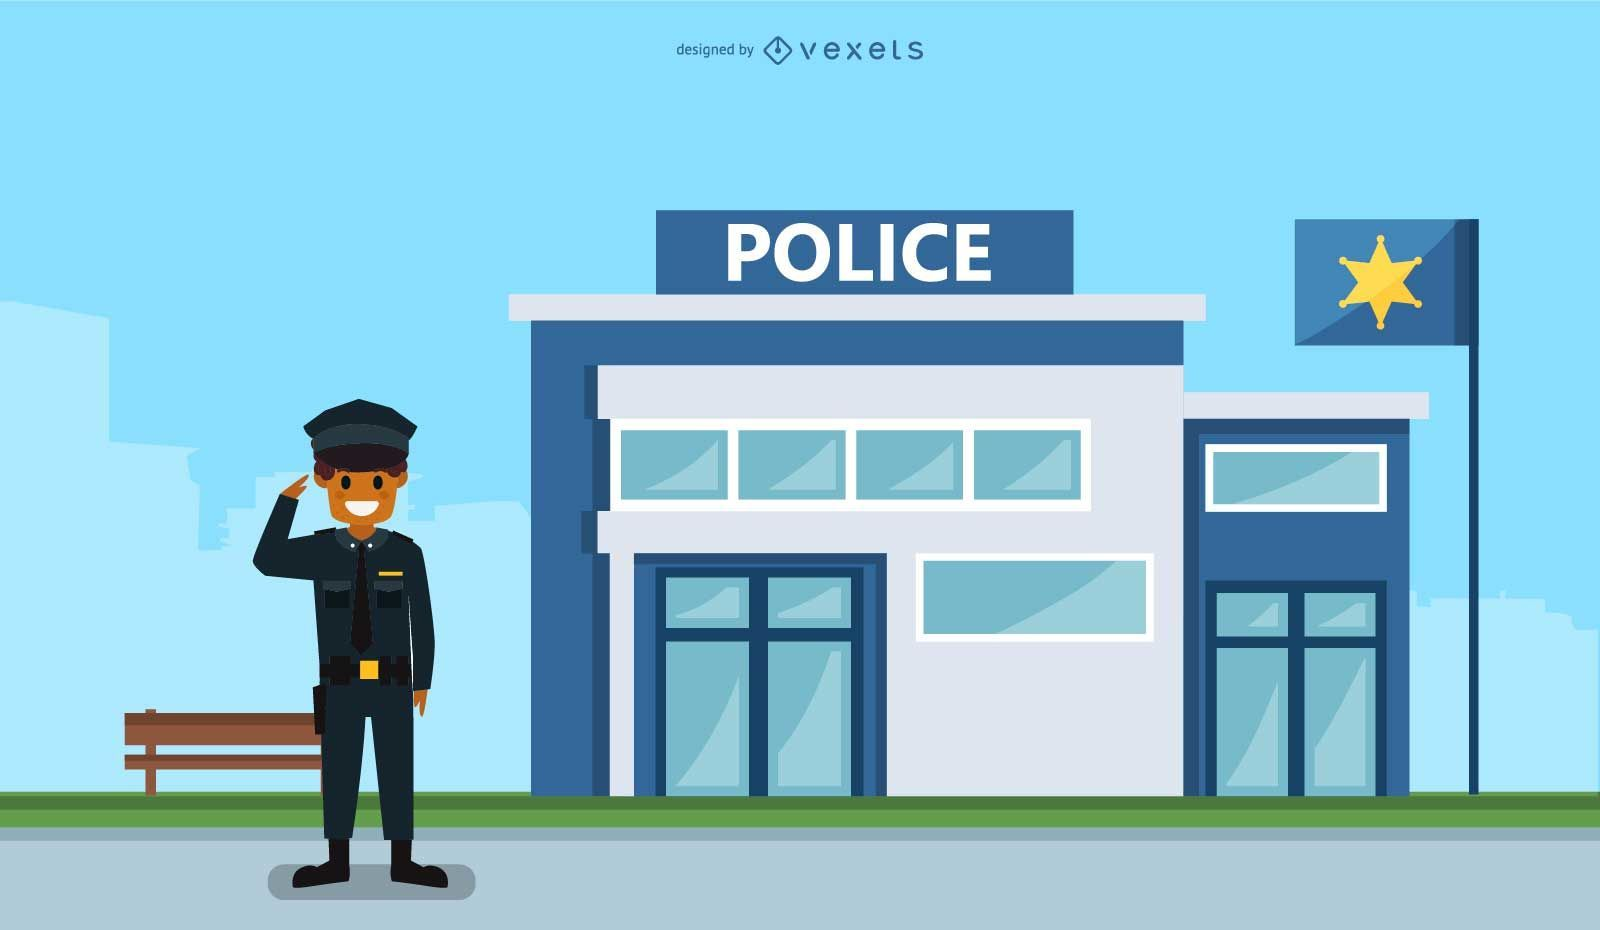 Police station illustration